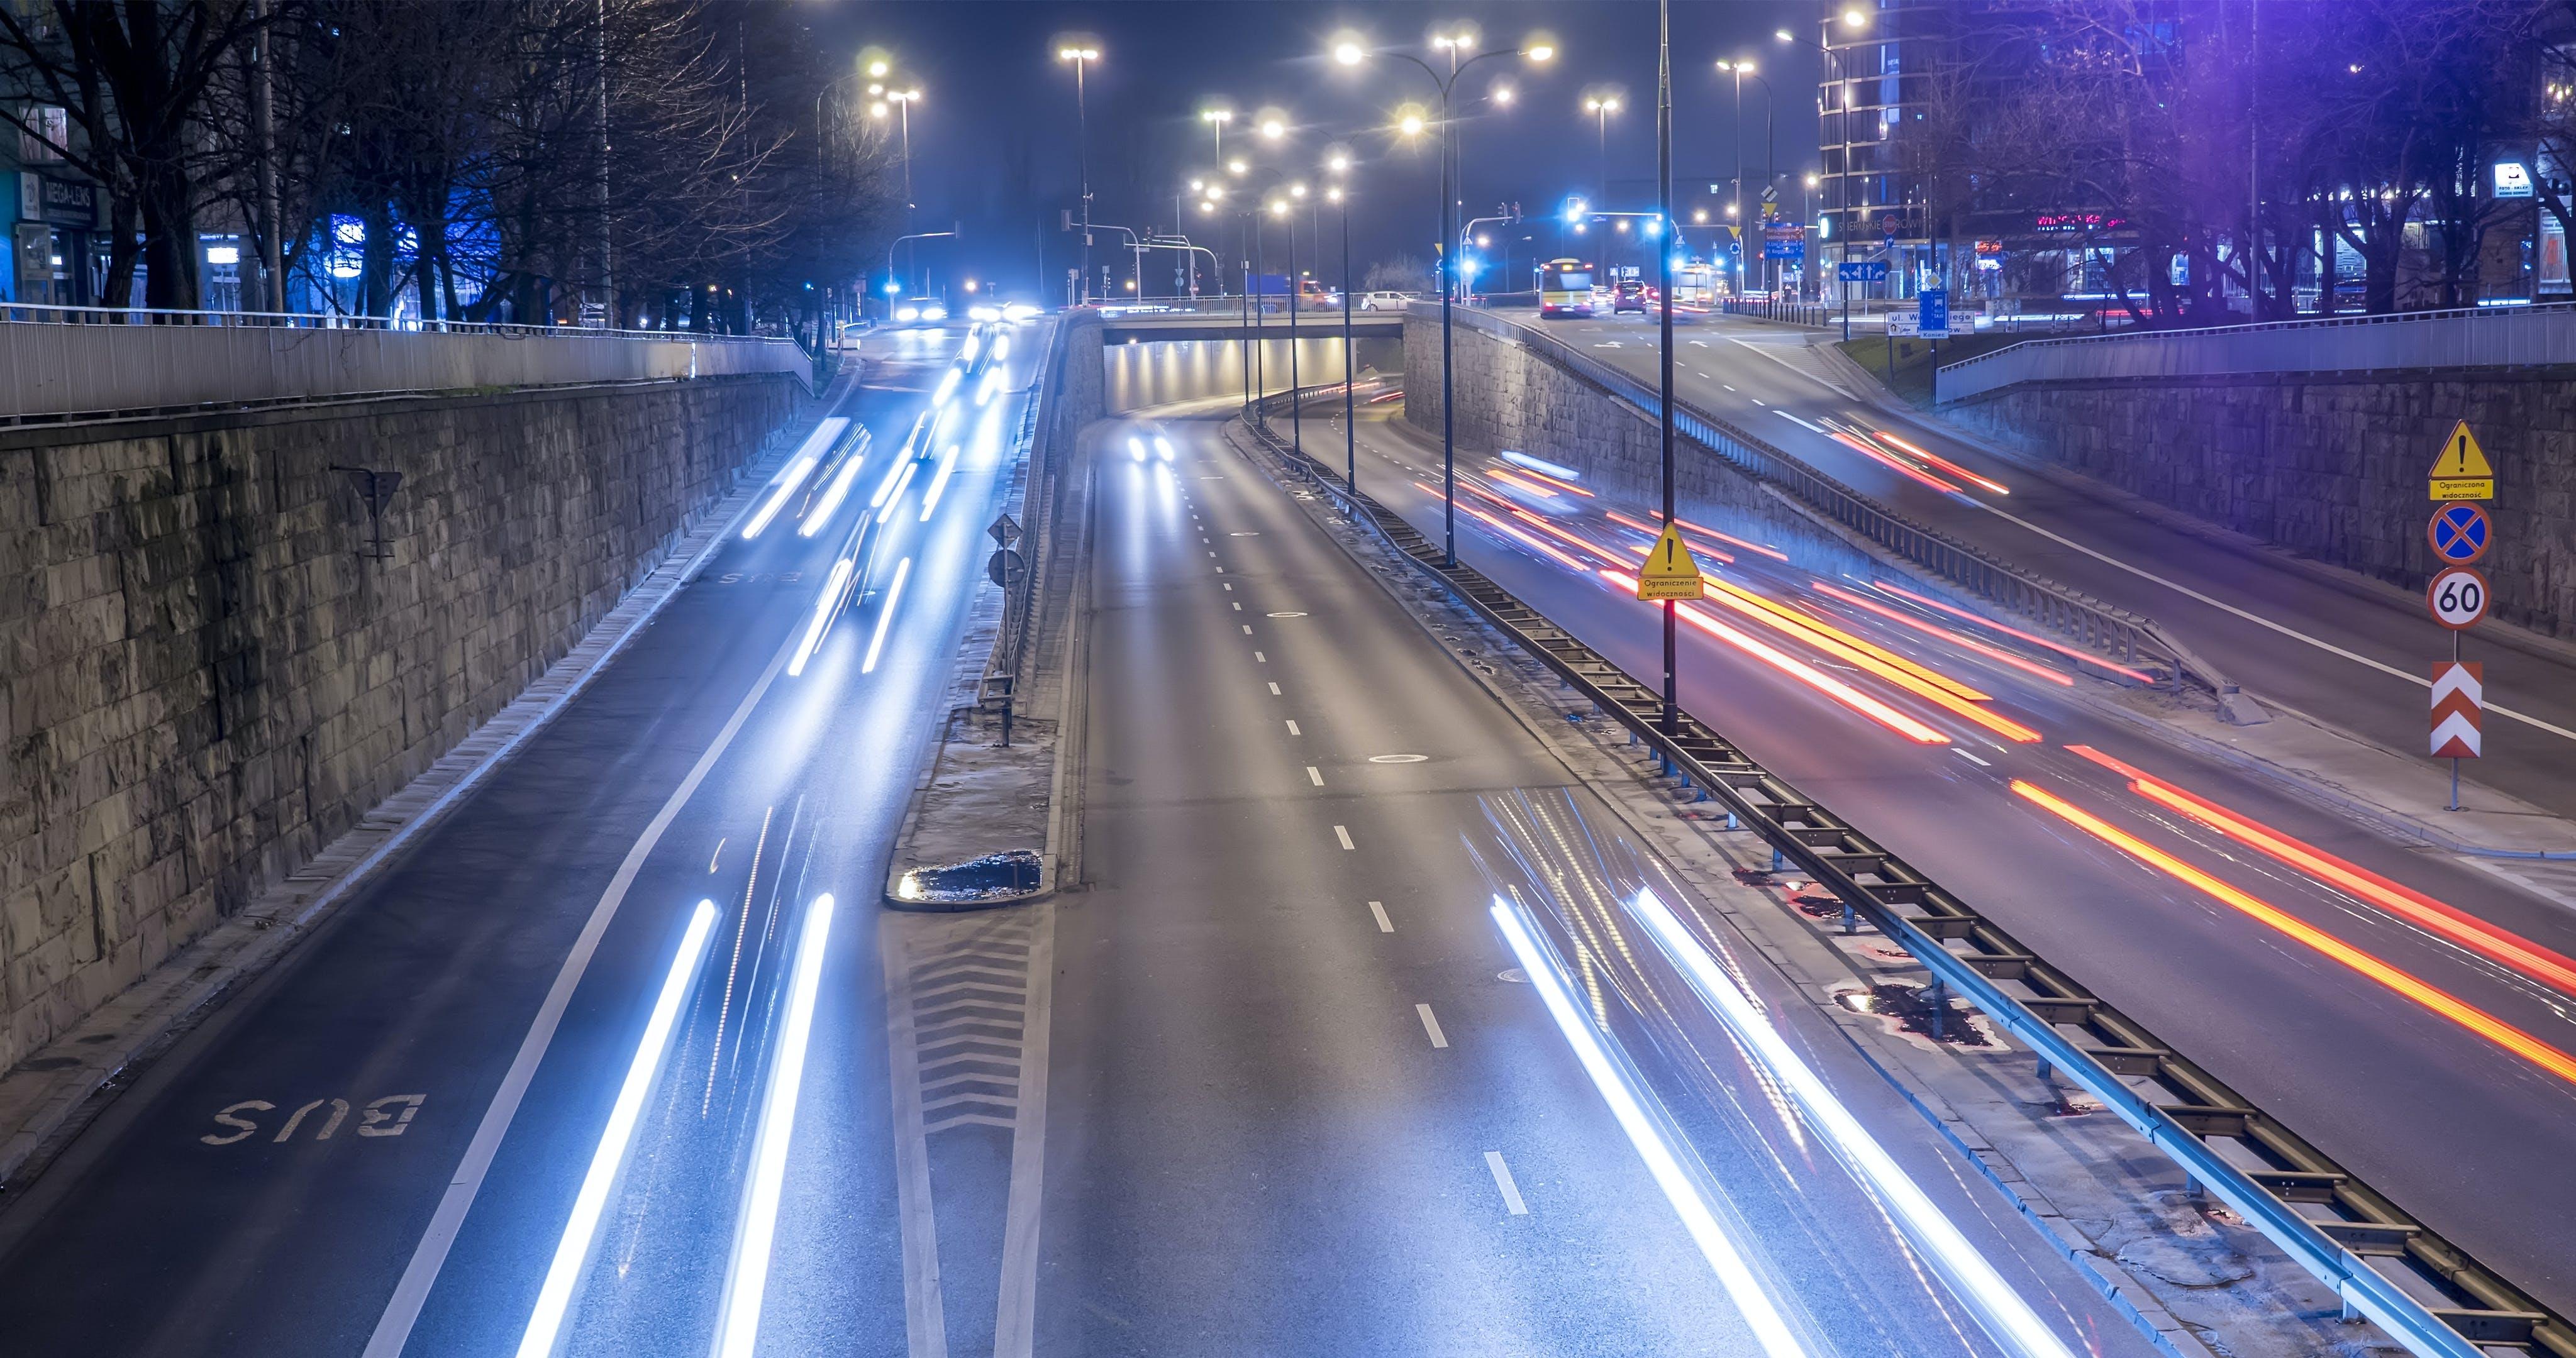 asphalt, blur, bridge